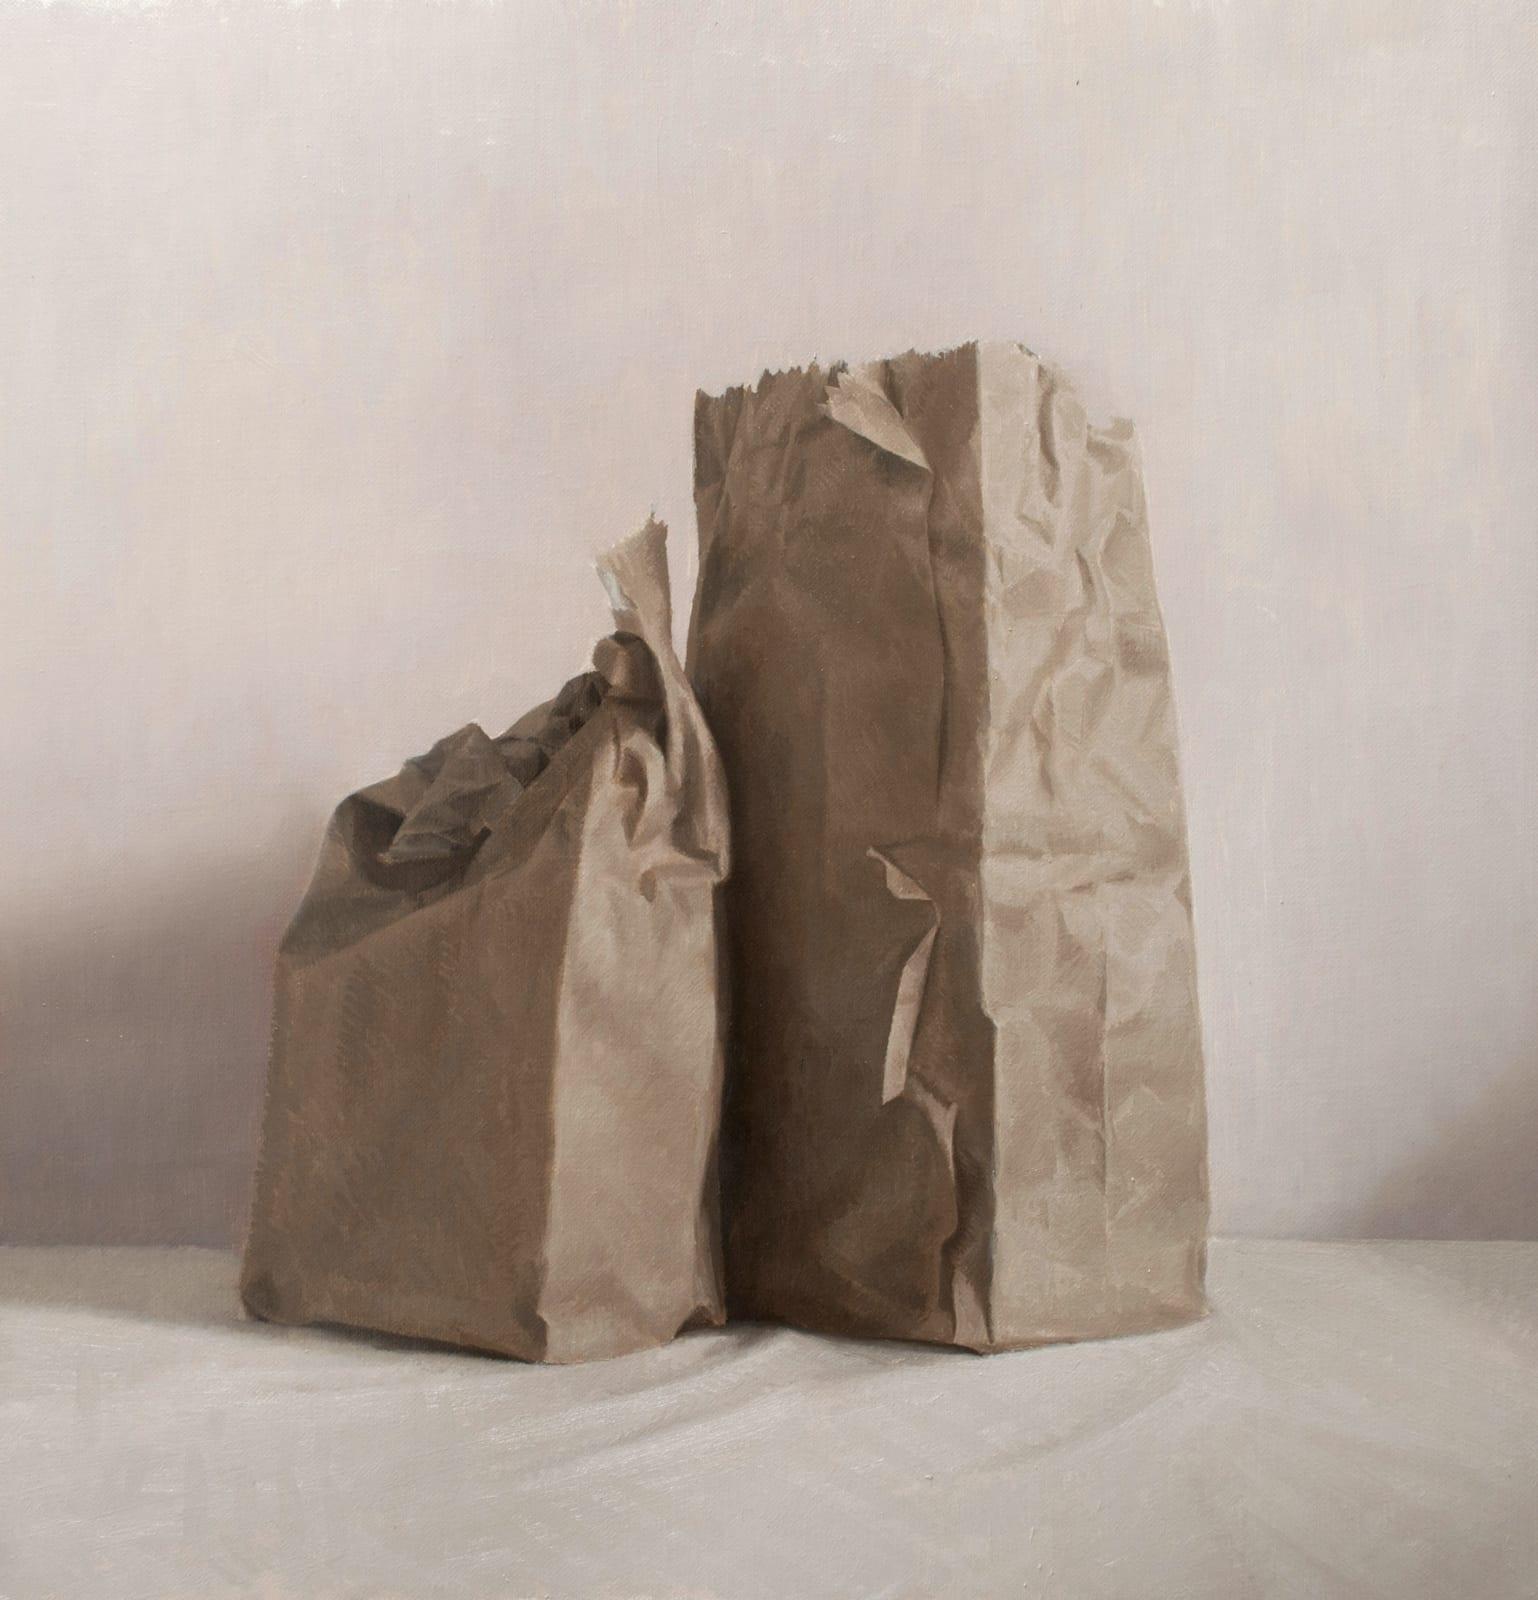 Martin Redmond Two bags Oil on linen 45 x 40 cm